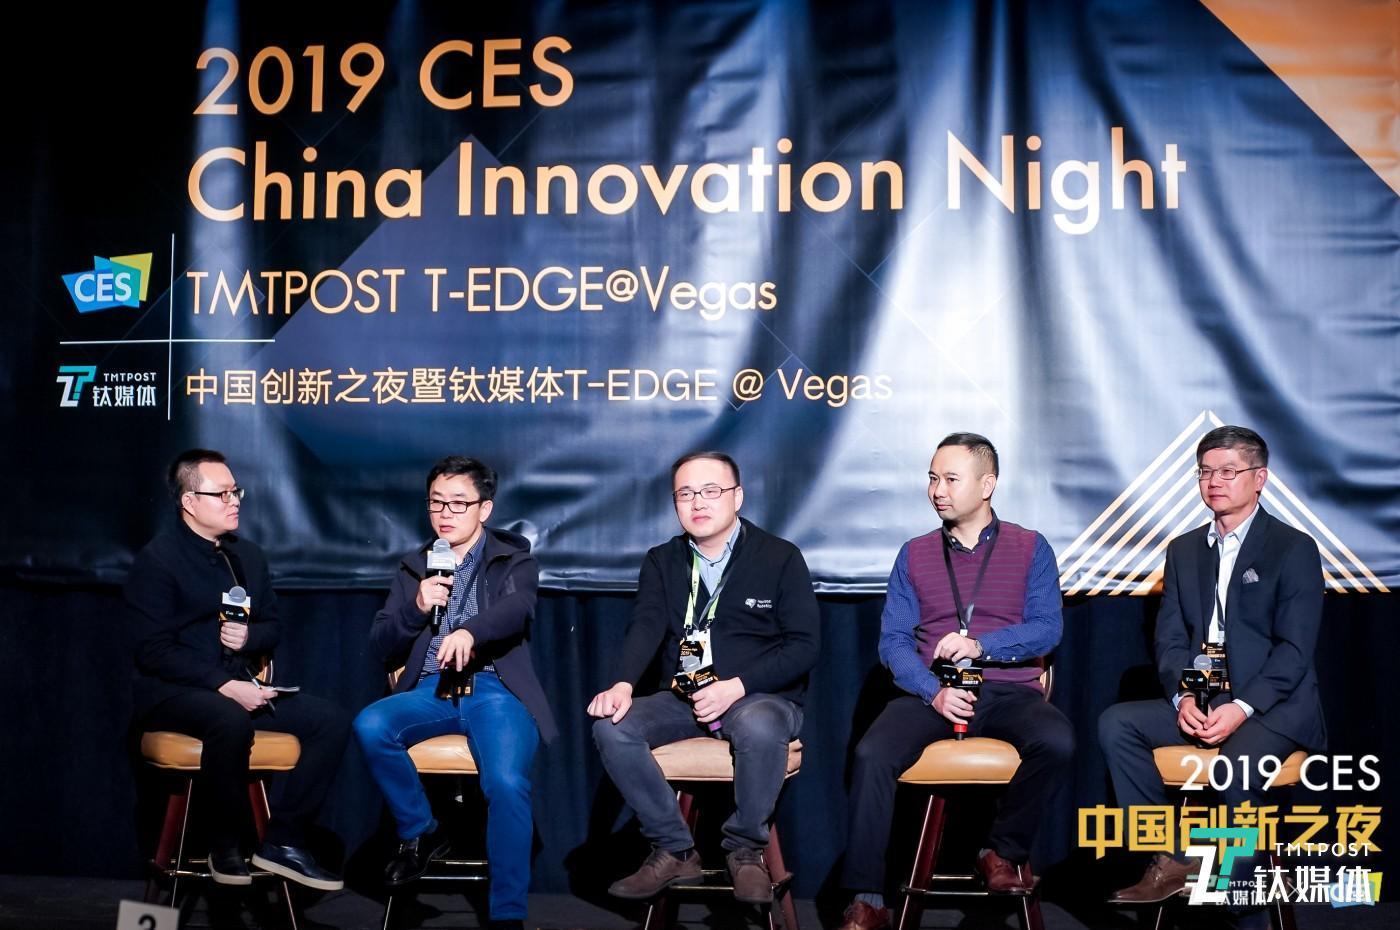 2019 CES 创新之夜上,钛媒体对话